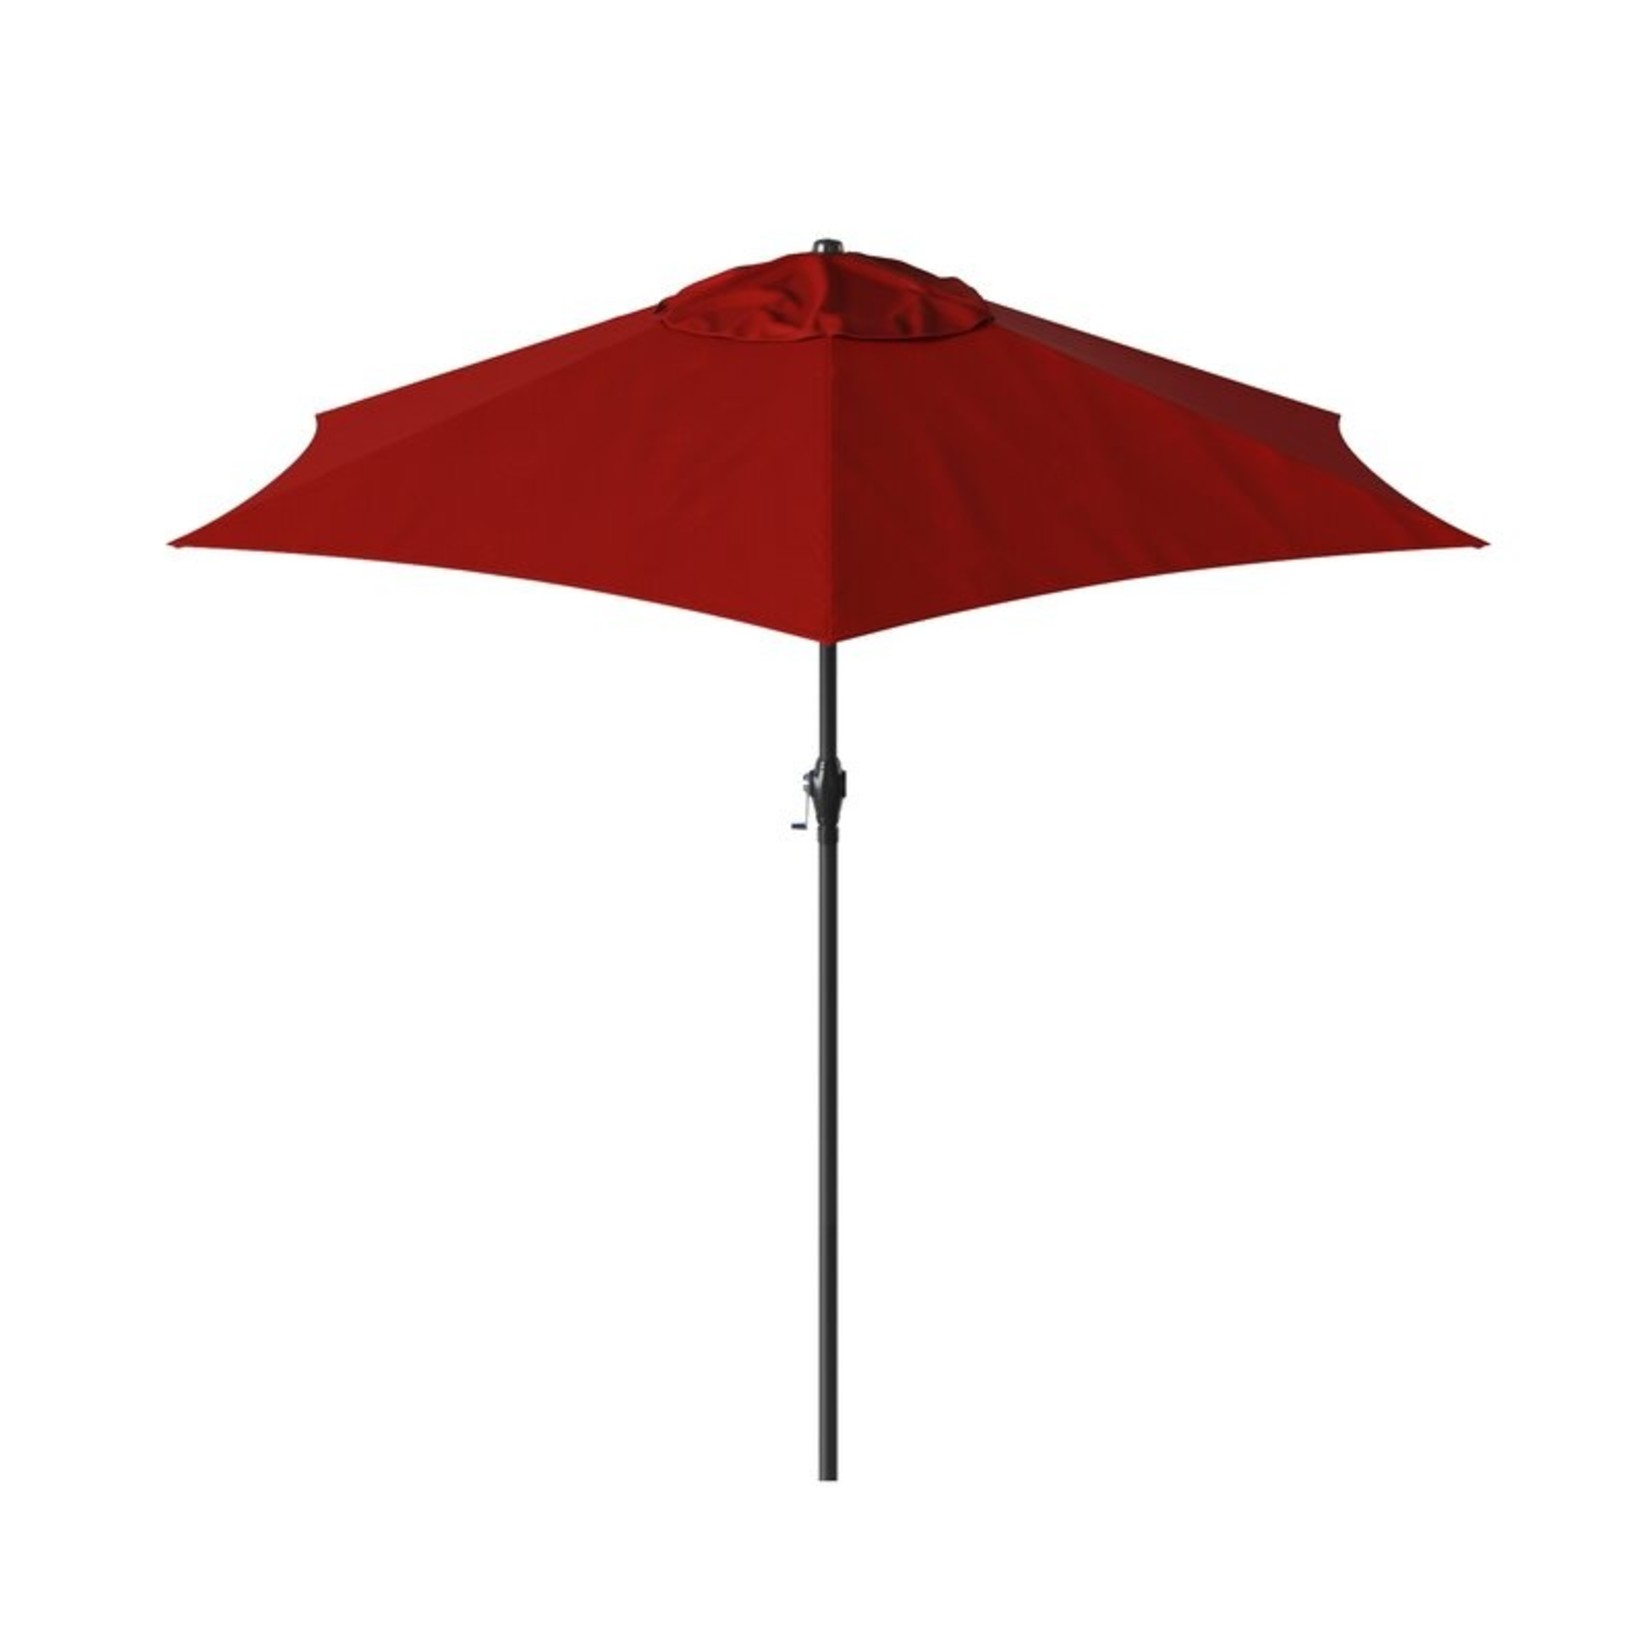 "*Kearney 108"" x 108"" Market Umbrella - Brick"